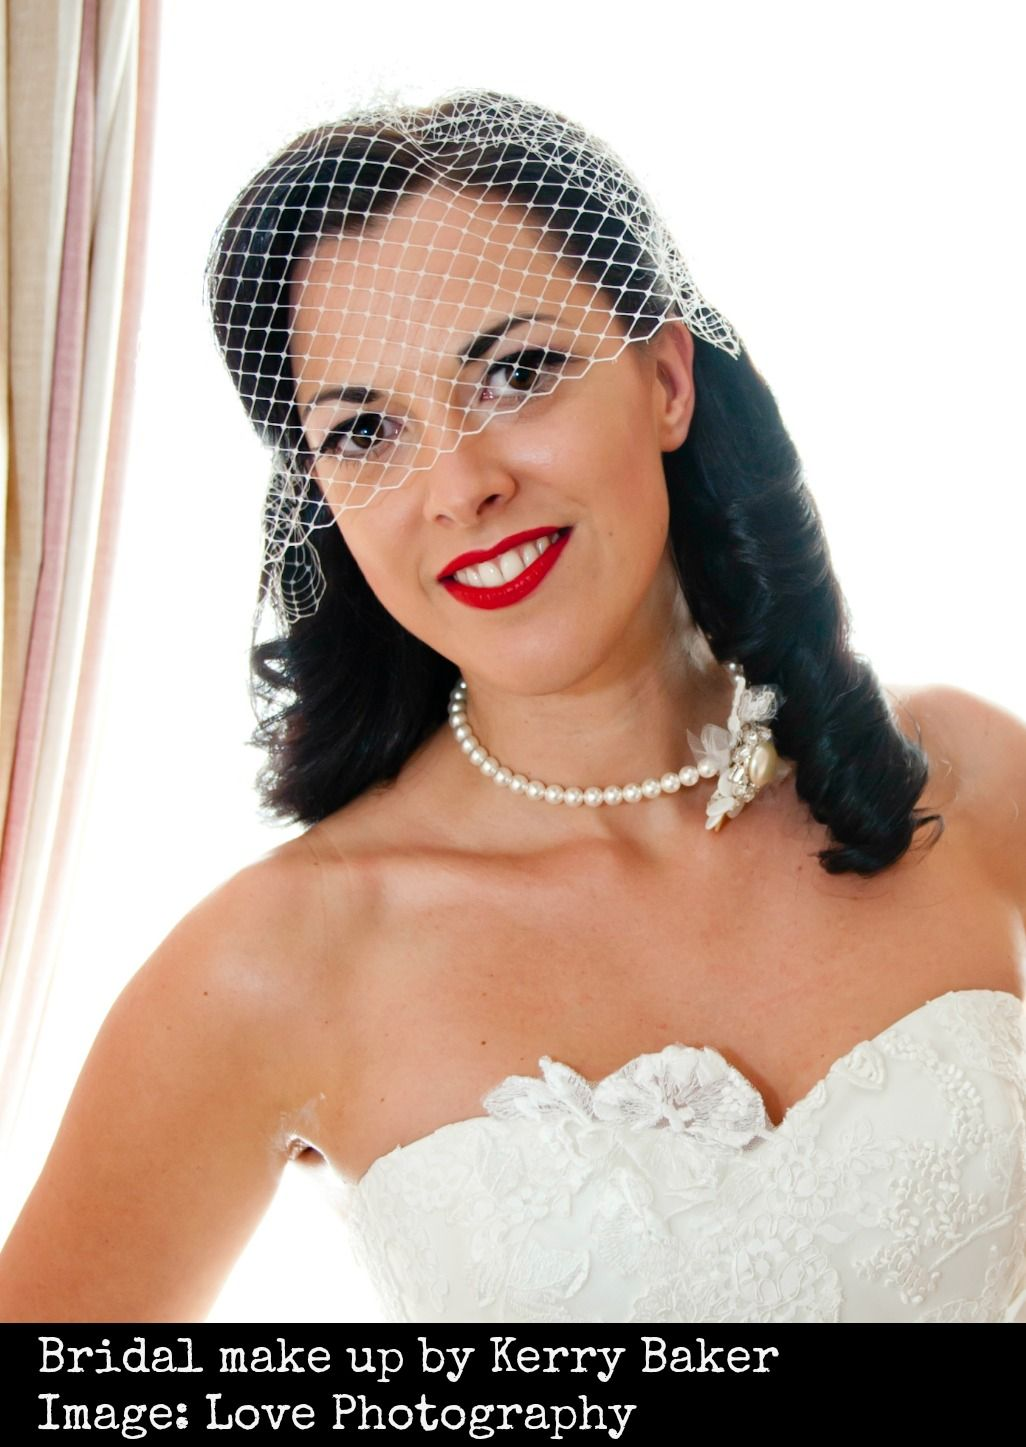 Vintage wedding day va va voom! Winged eye liner and